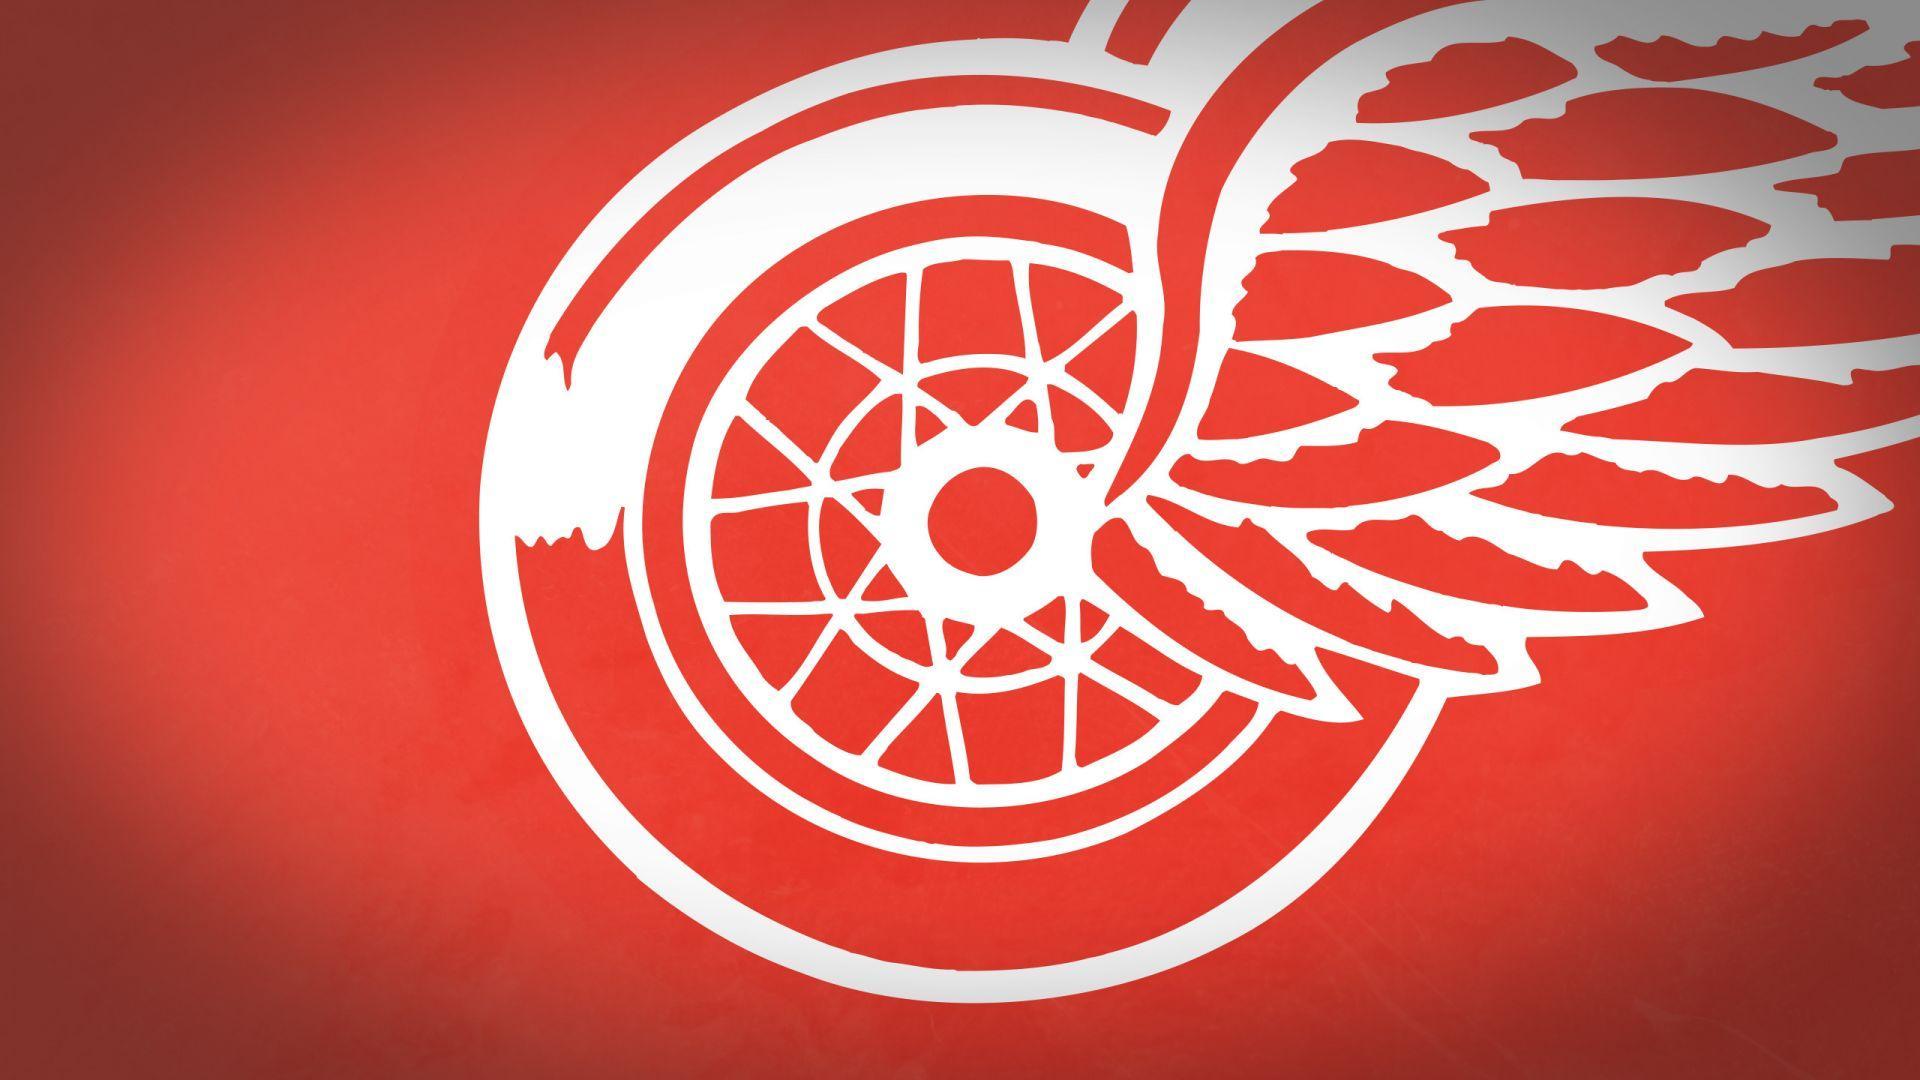 Detroit Red Wings Iphone 5 Wallpaper Wallpaper   RedHDWallpaperS